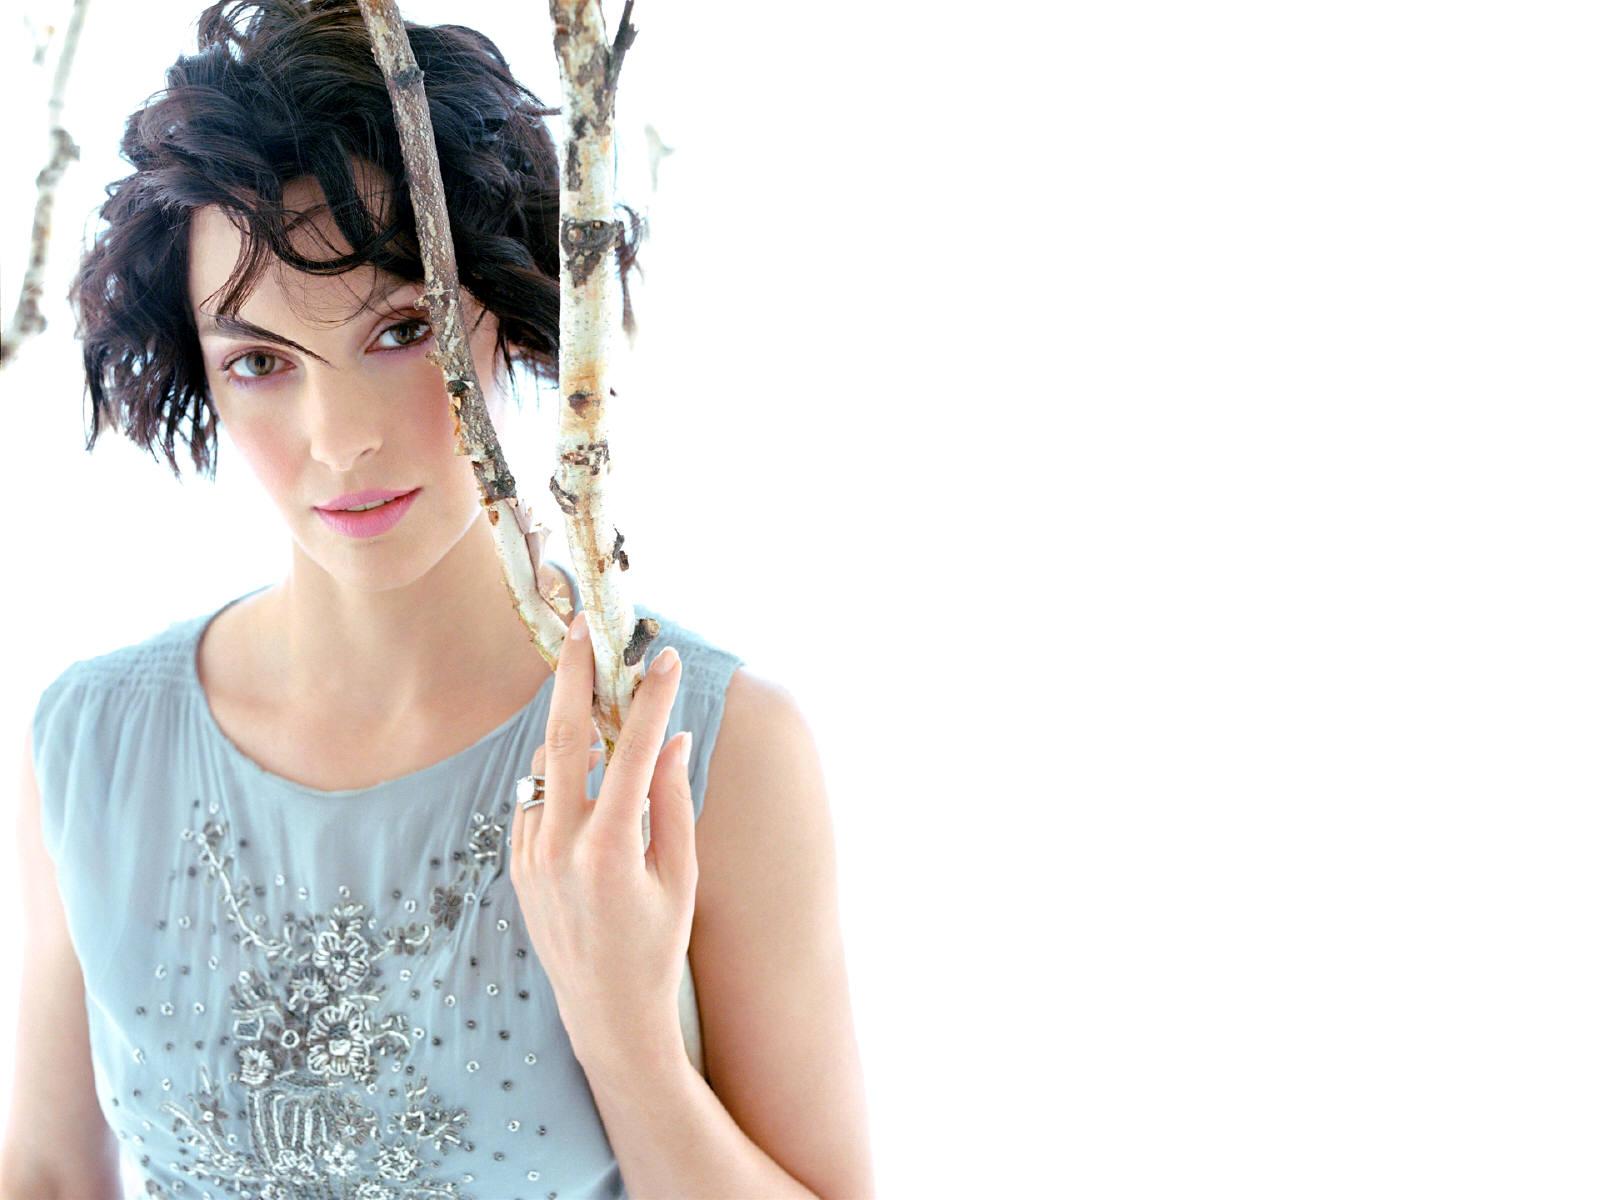 hot woman ashley judd - wallpaper site